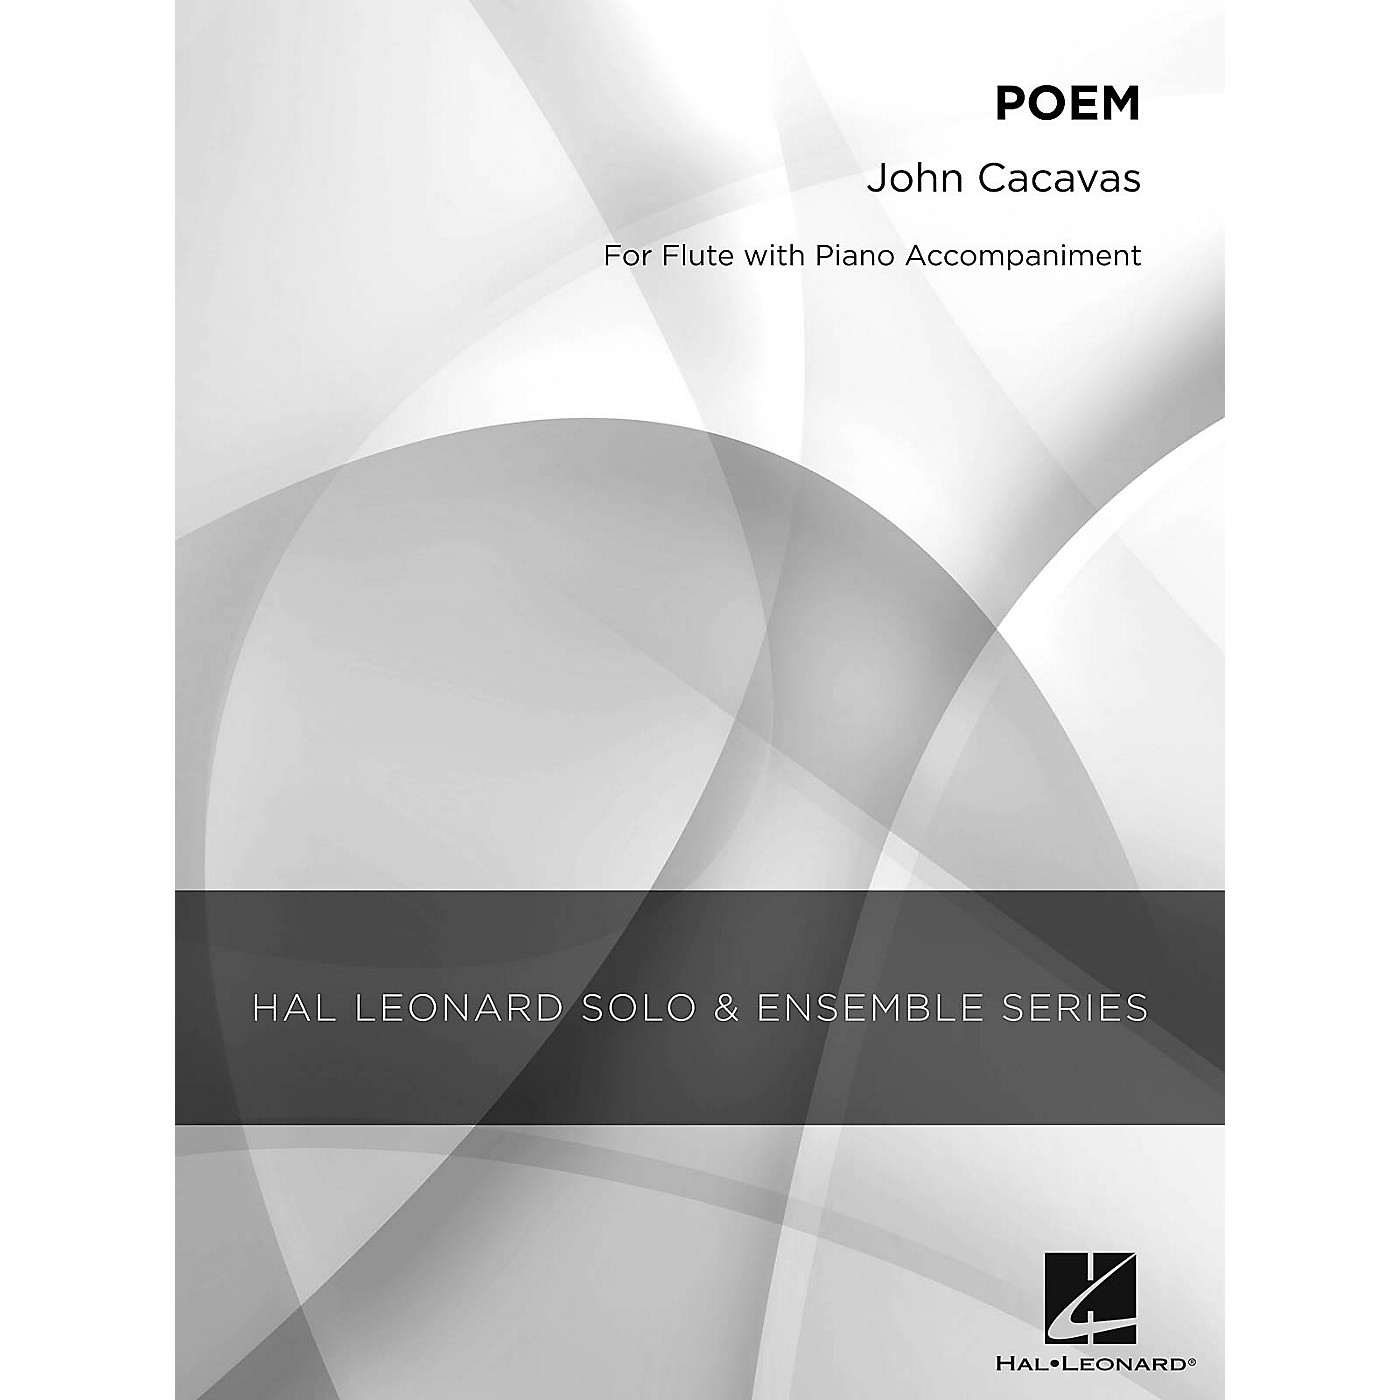 Hal Leonard Poem (Grade 3 Flute Solo) Concert Band Level 2.5 Composed by John Cacavas thumbnail